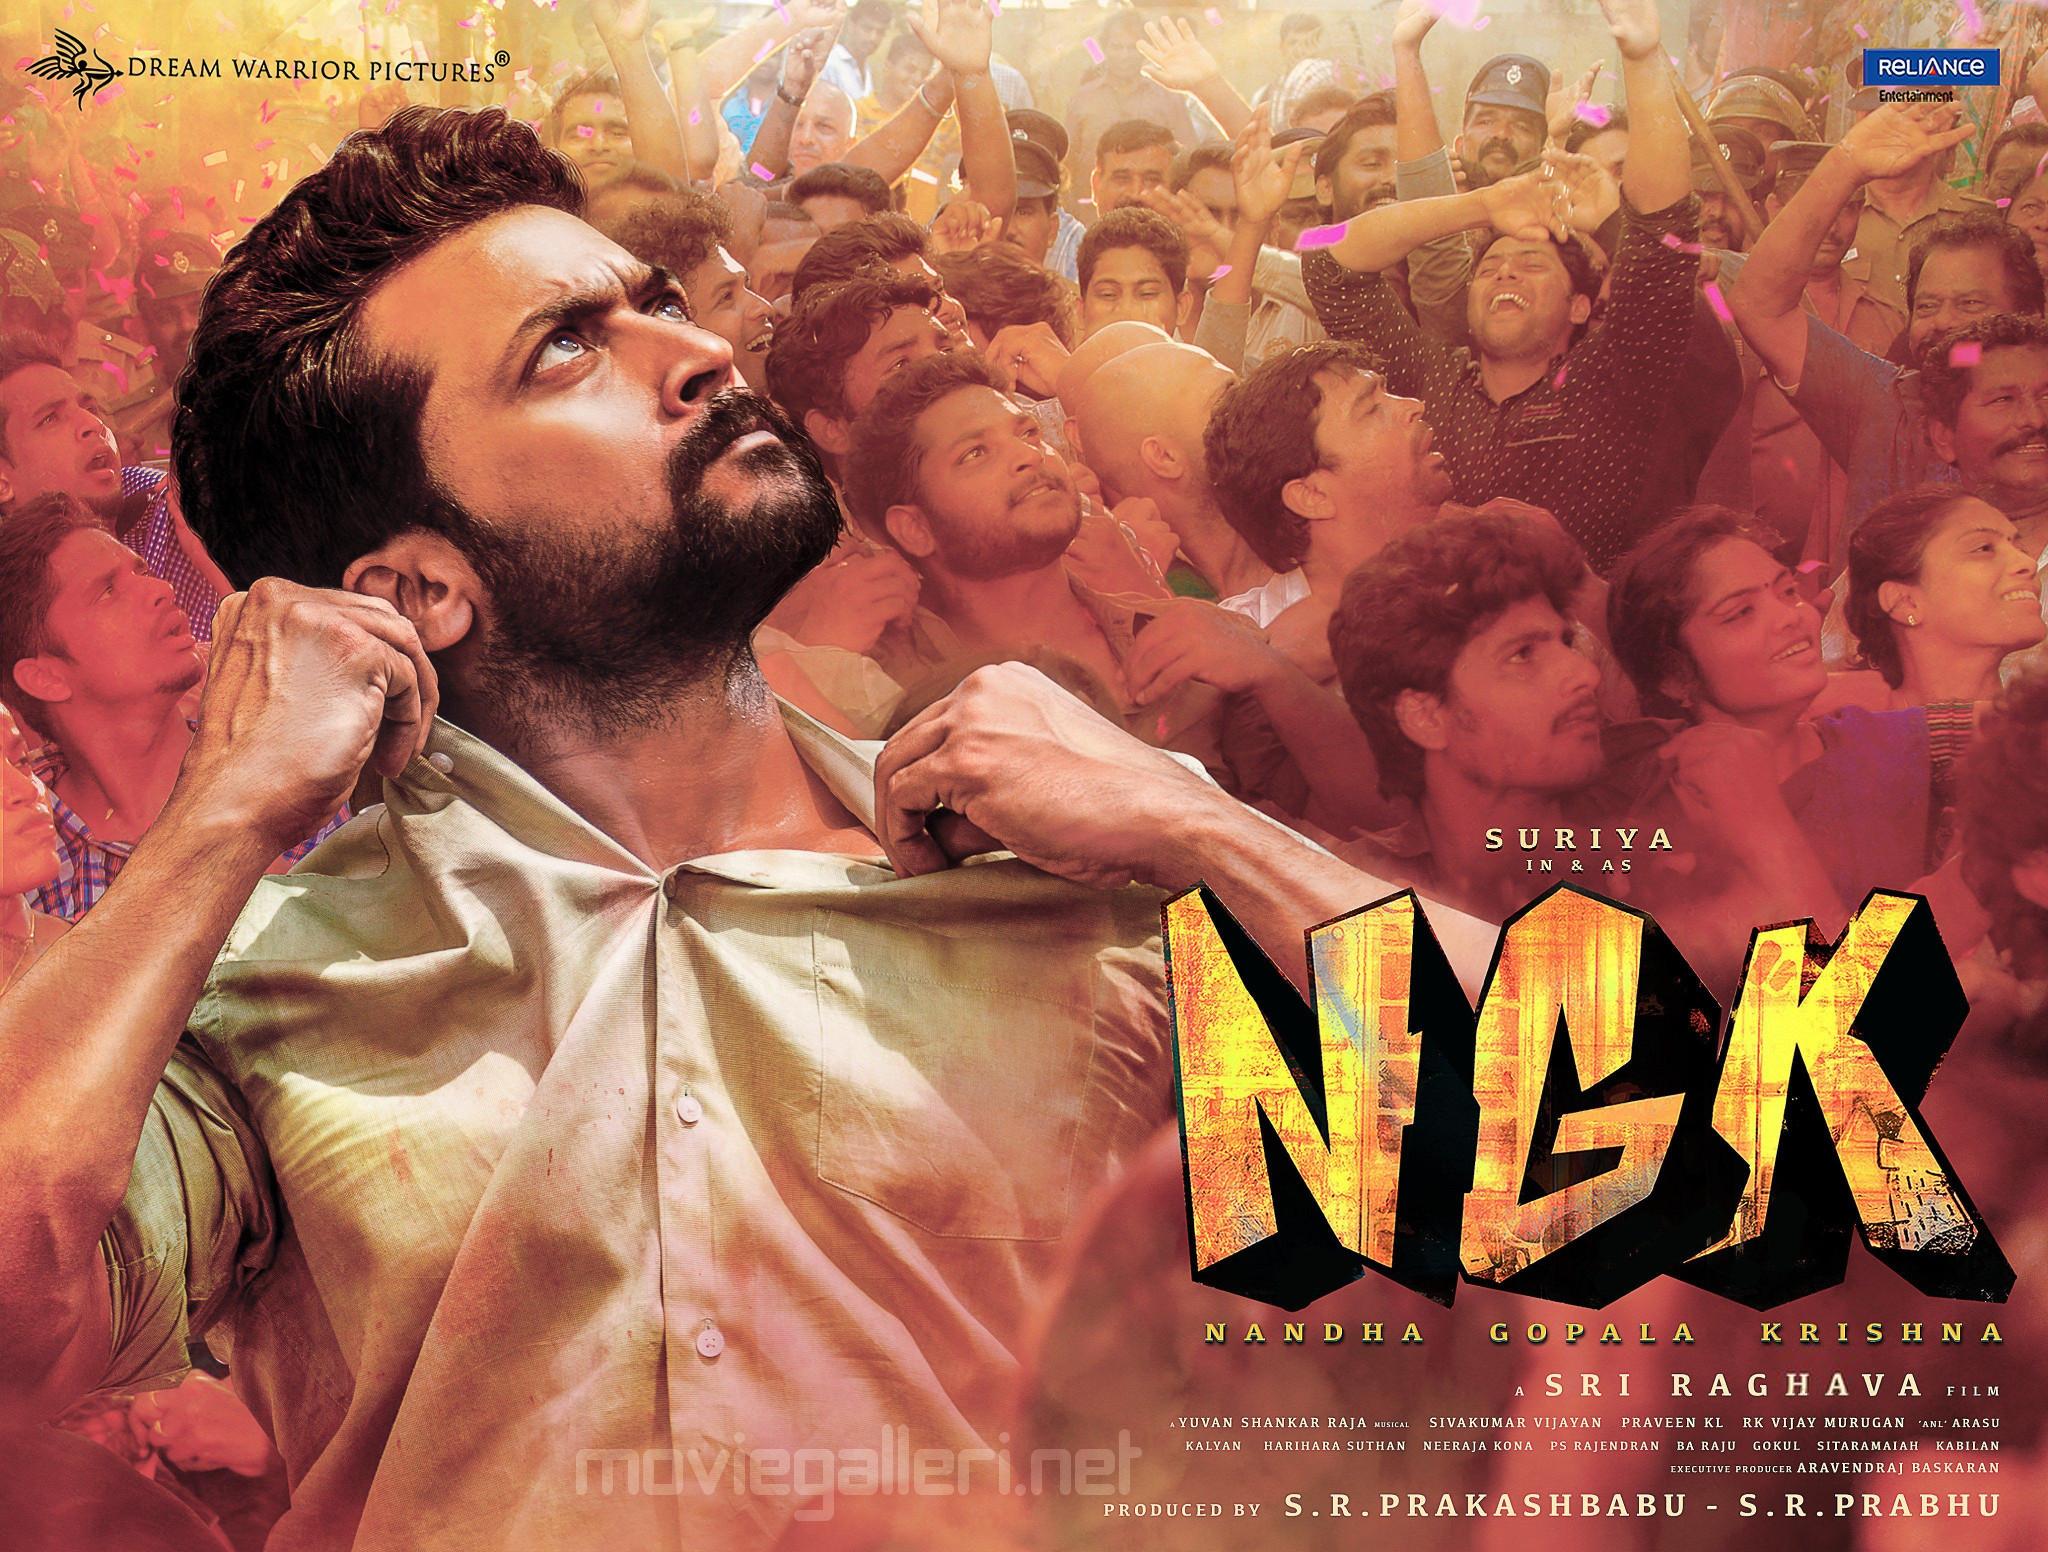 Suriya 36 NGK second look Nandha Gopala Krishna Poster Deepavali Release